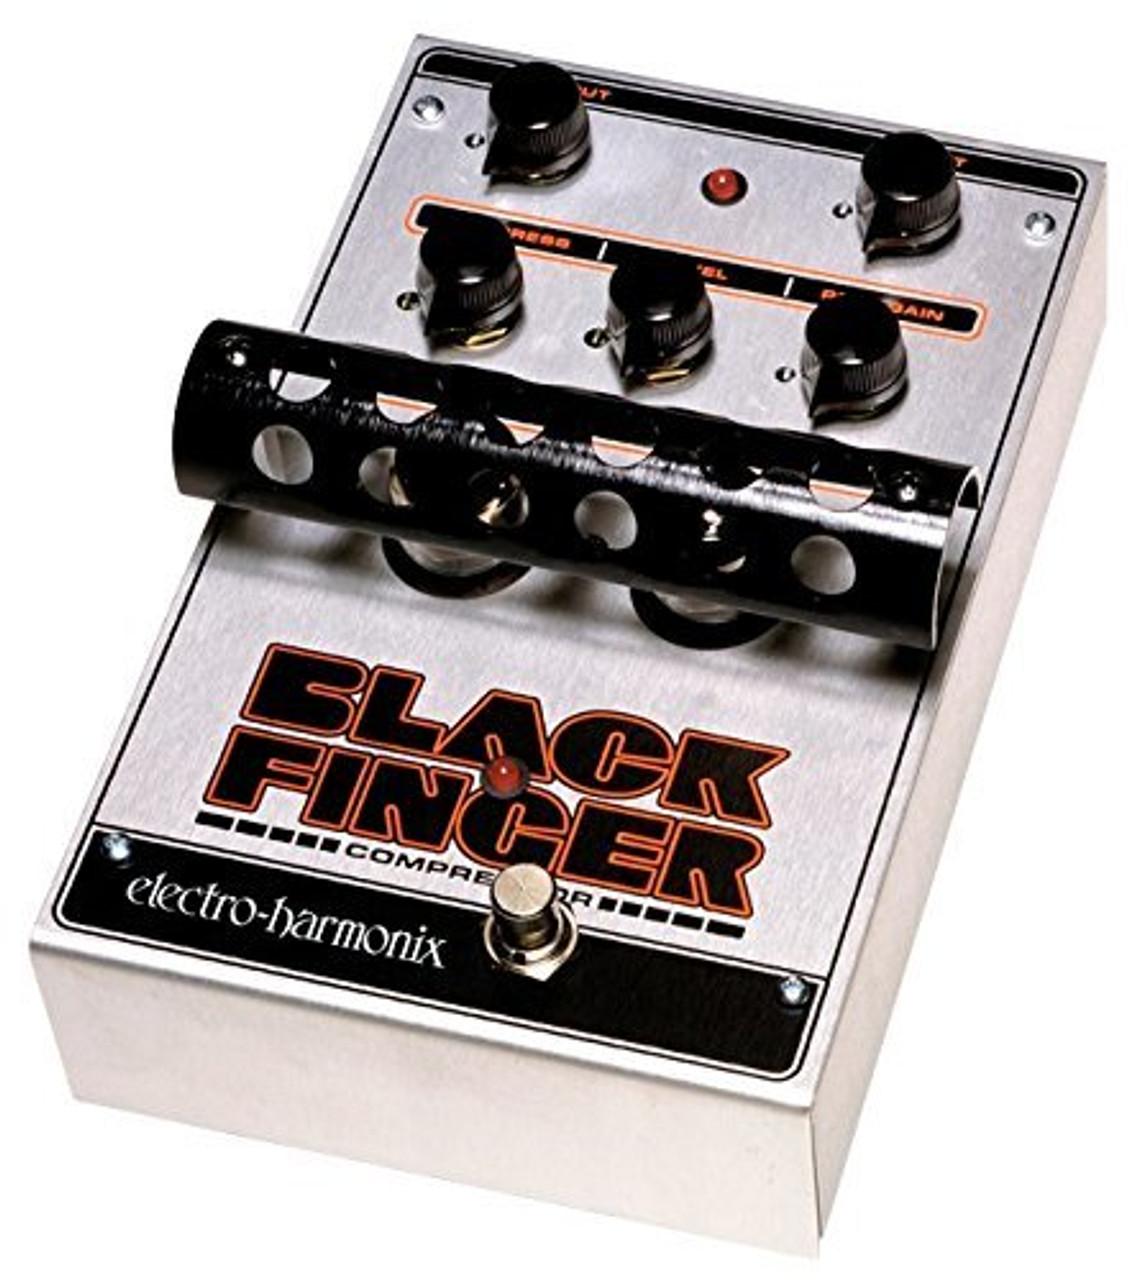 Electro Harmonix BLACK FINGER Optical Tube Compressor, 12AC-1000 PSU included